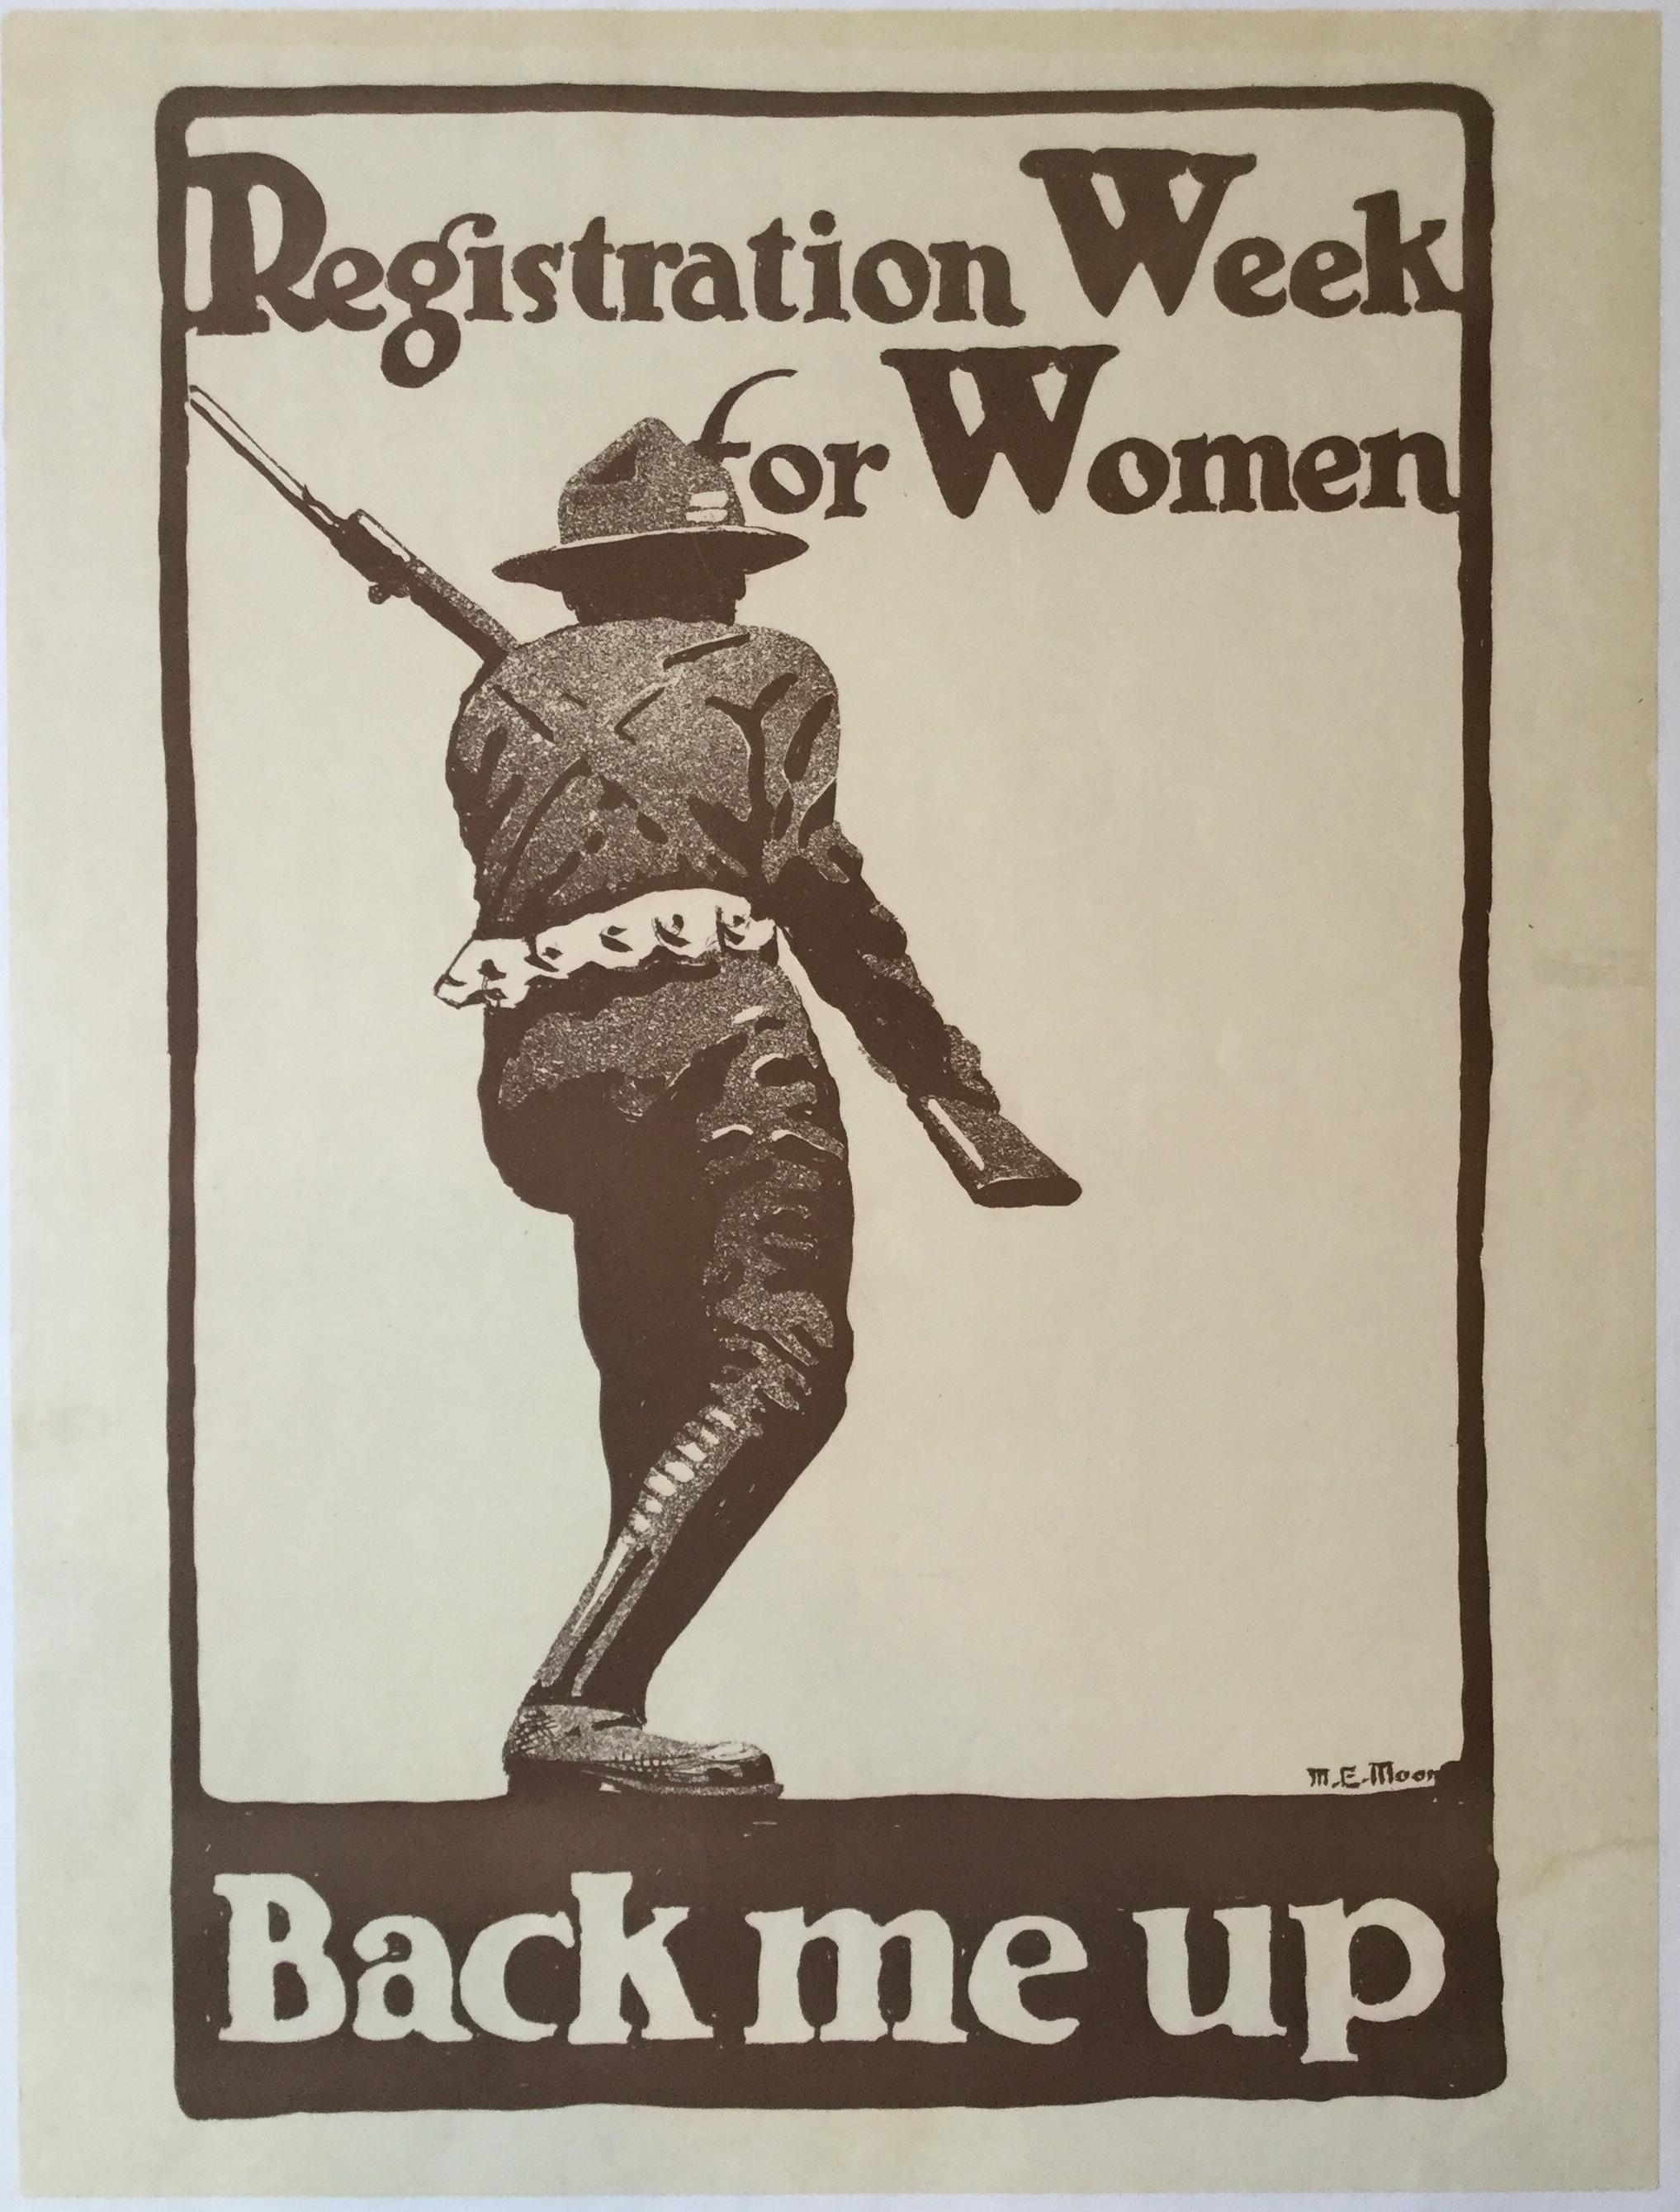 WW1103REGISTRATION WEEK FOR WOMEN - BACK ME UP